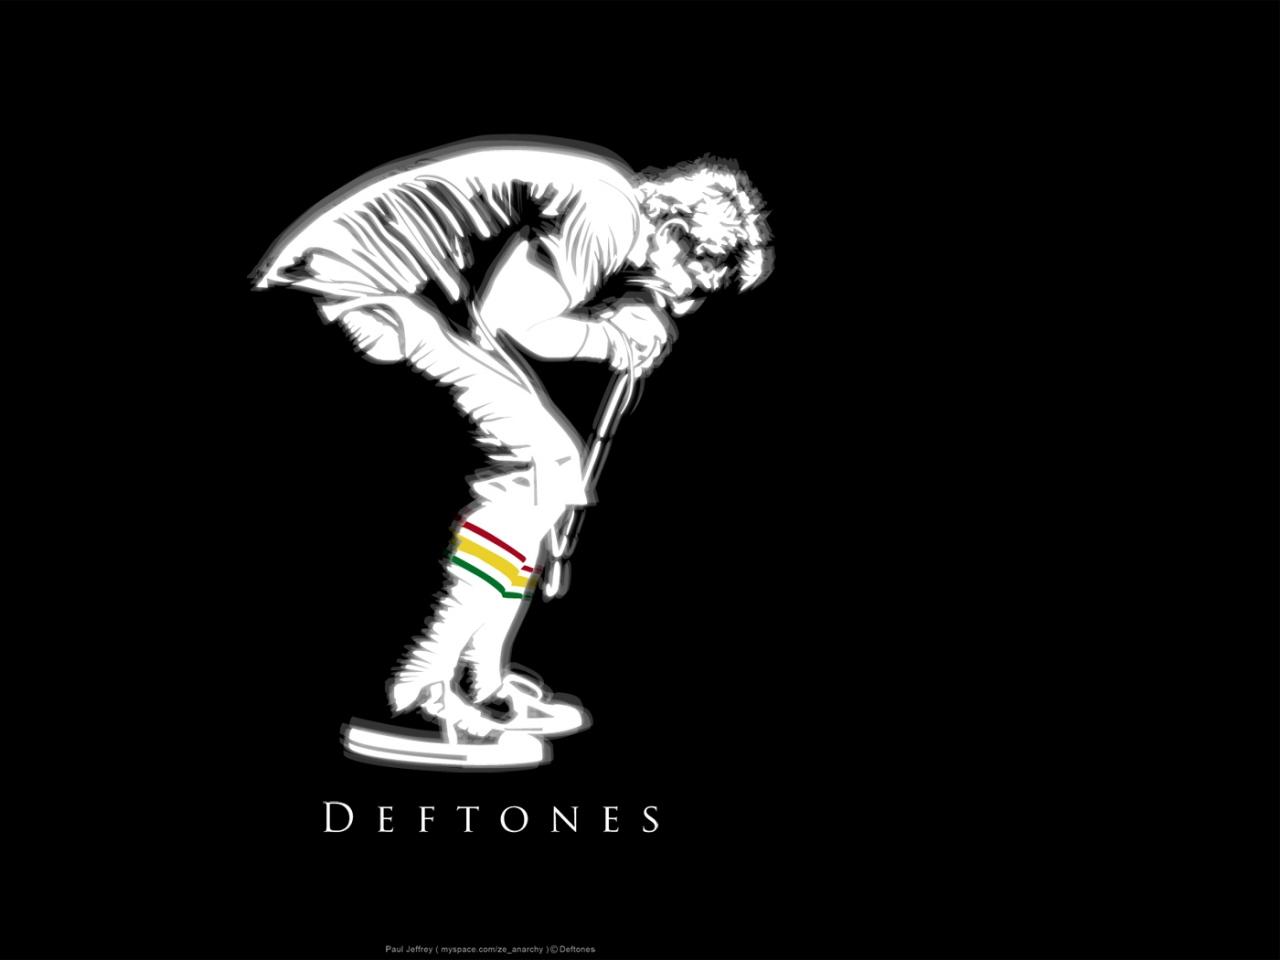 Deftones Background Silhouette Singer Microphone X Hd Wallpaper HD 1280x960